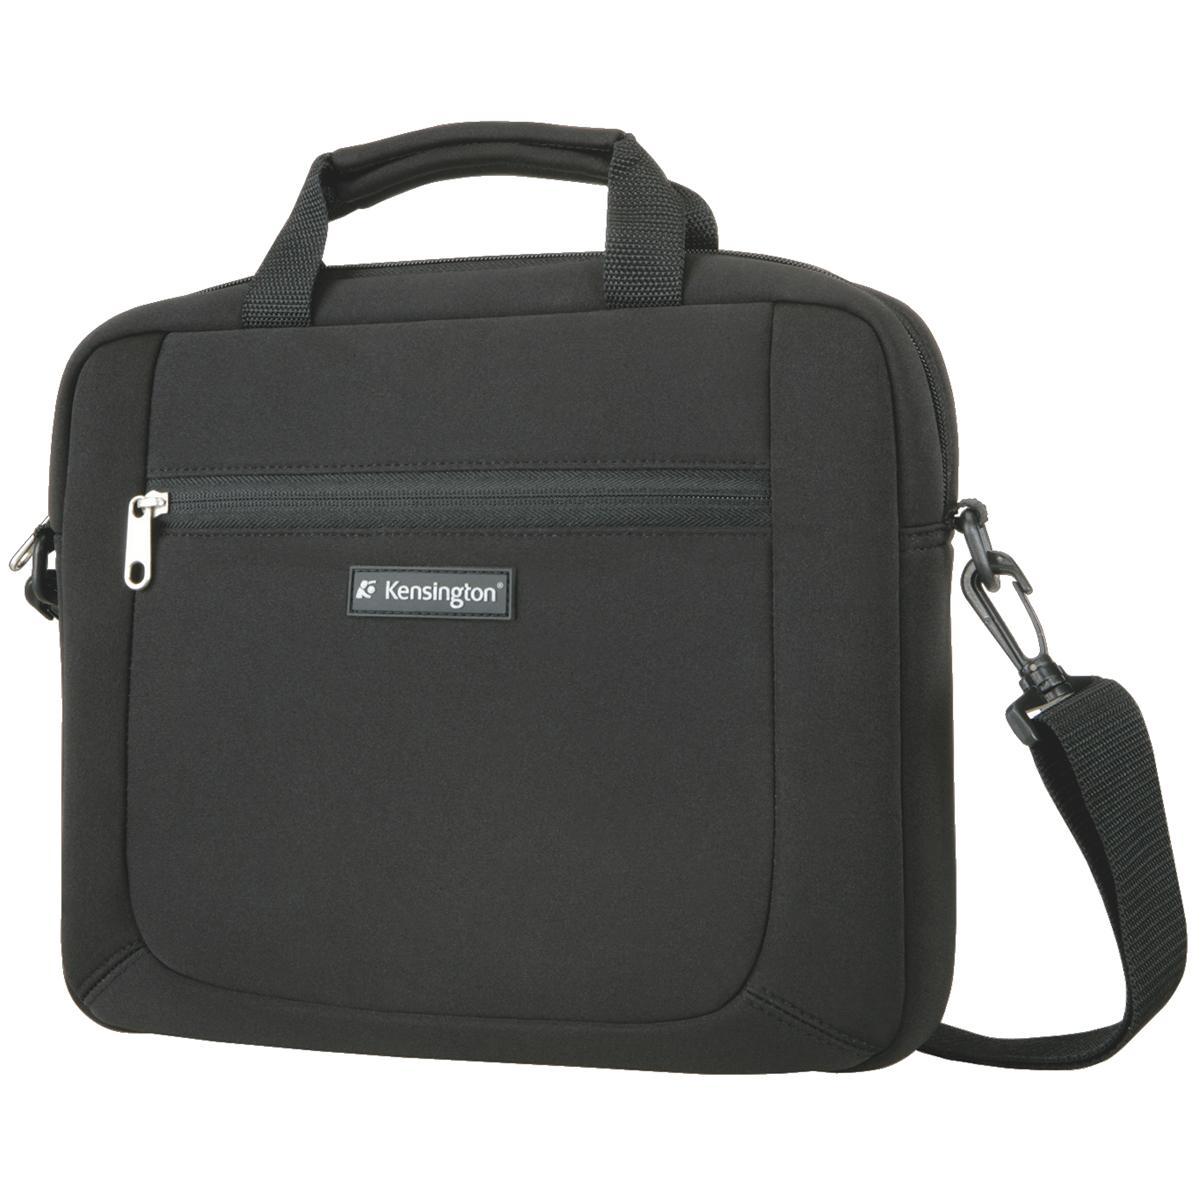 Kensington K62569US SP12 Simply Portable Neoprene Sleeve 12 Inch